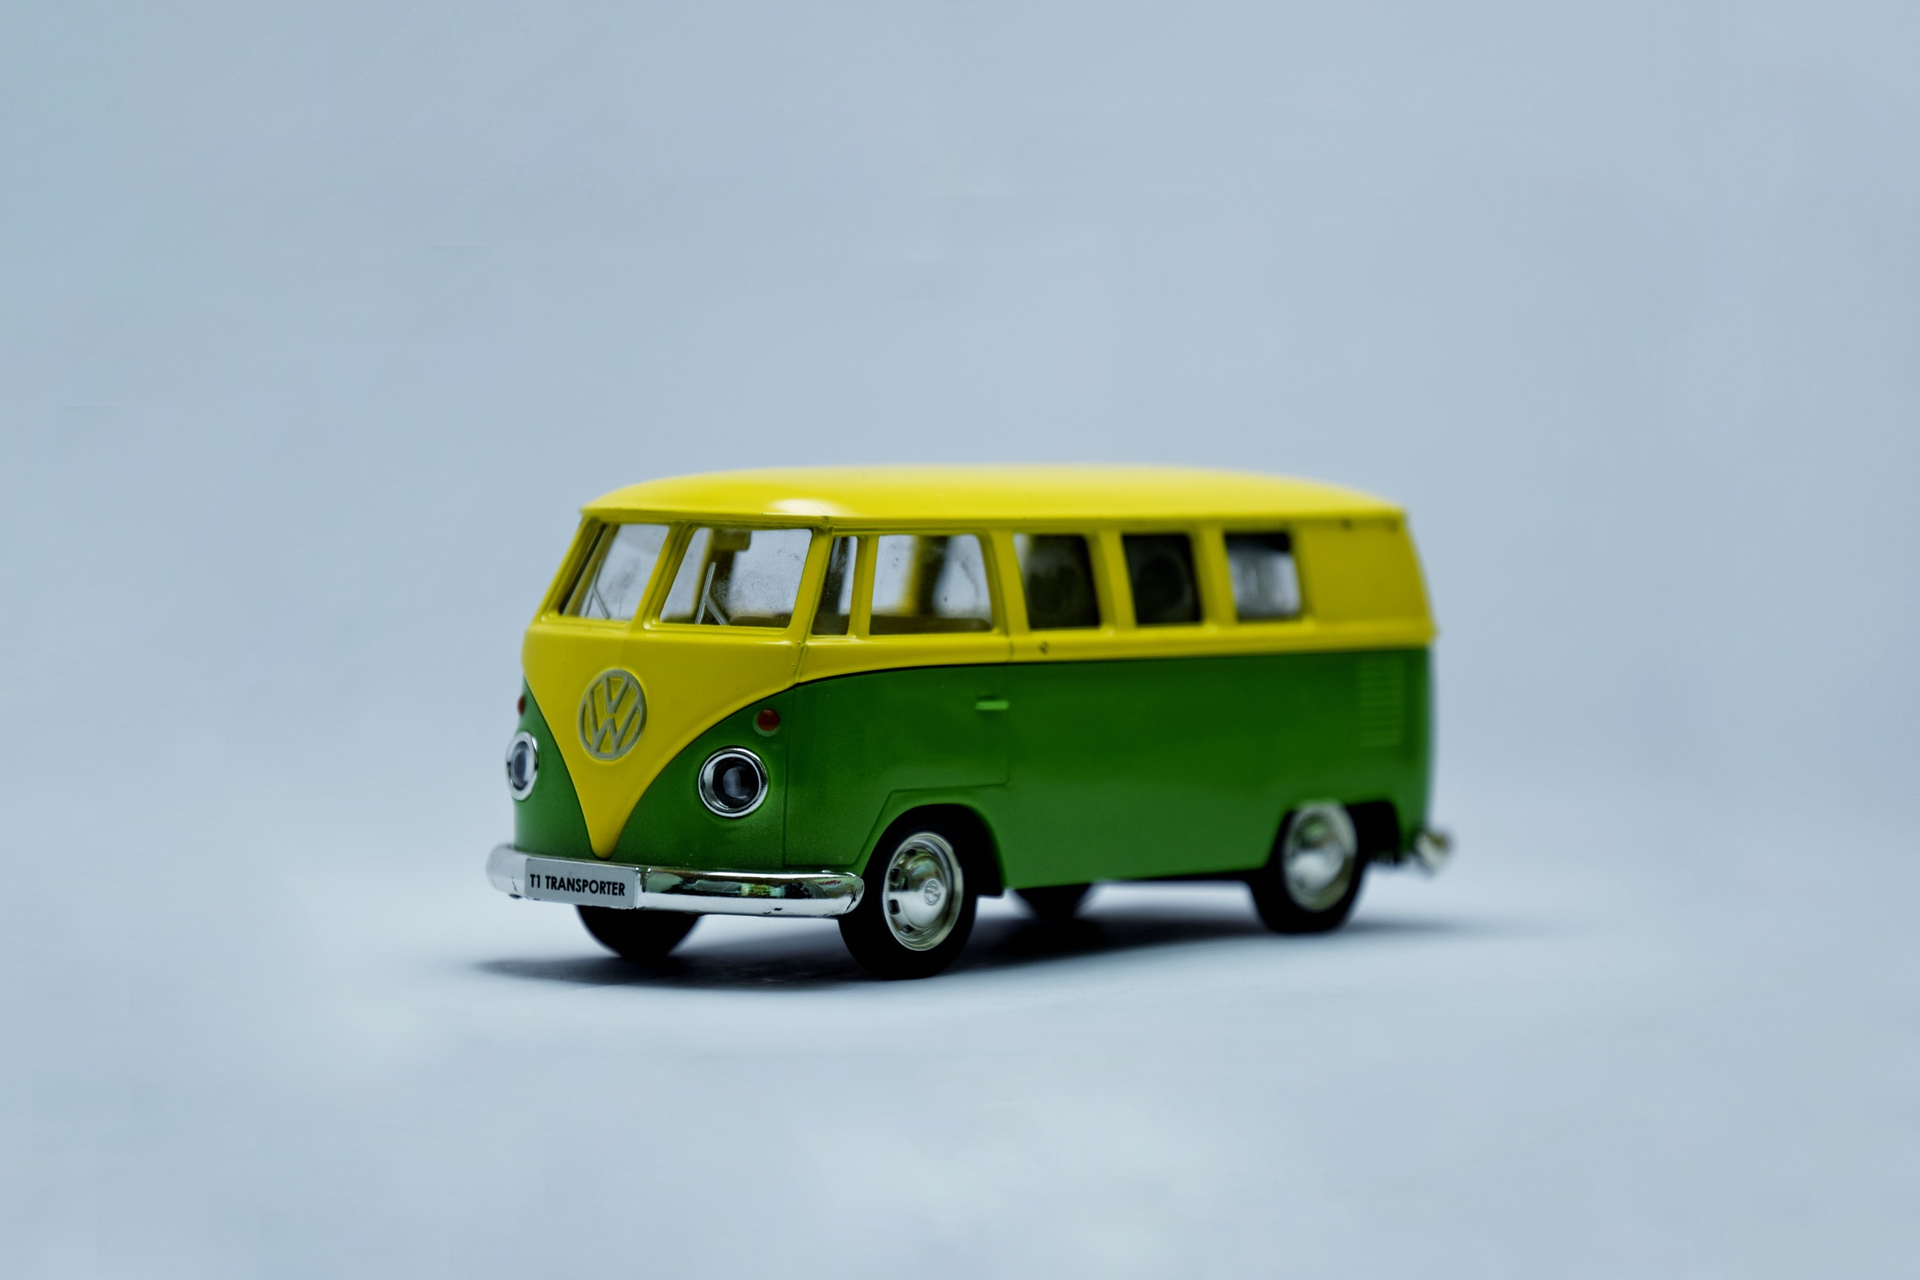 Community Transport Image